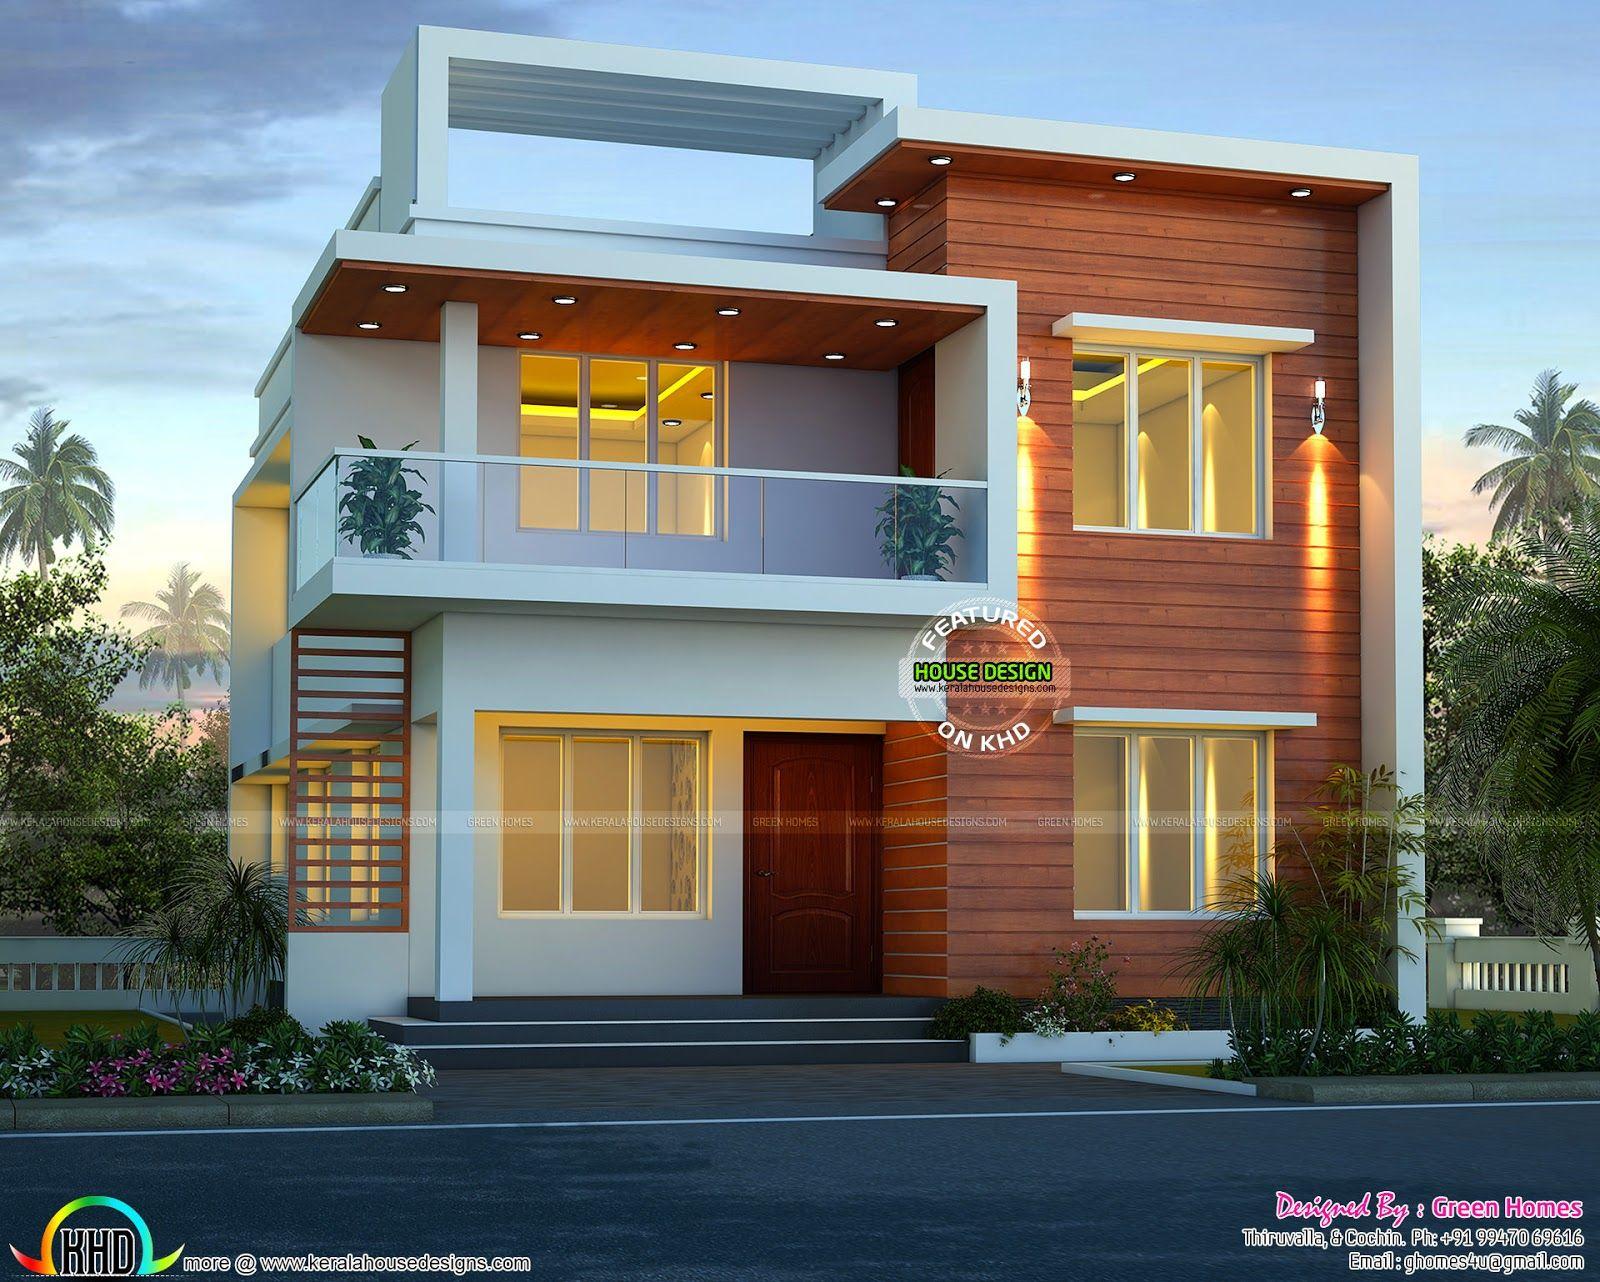 Cute modern house architecture also buildings part elevation rh pinterest